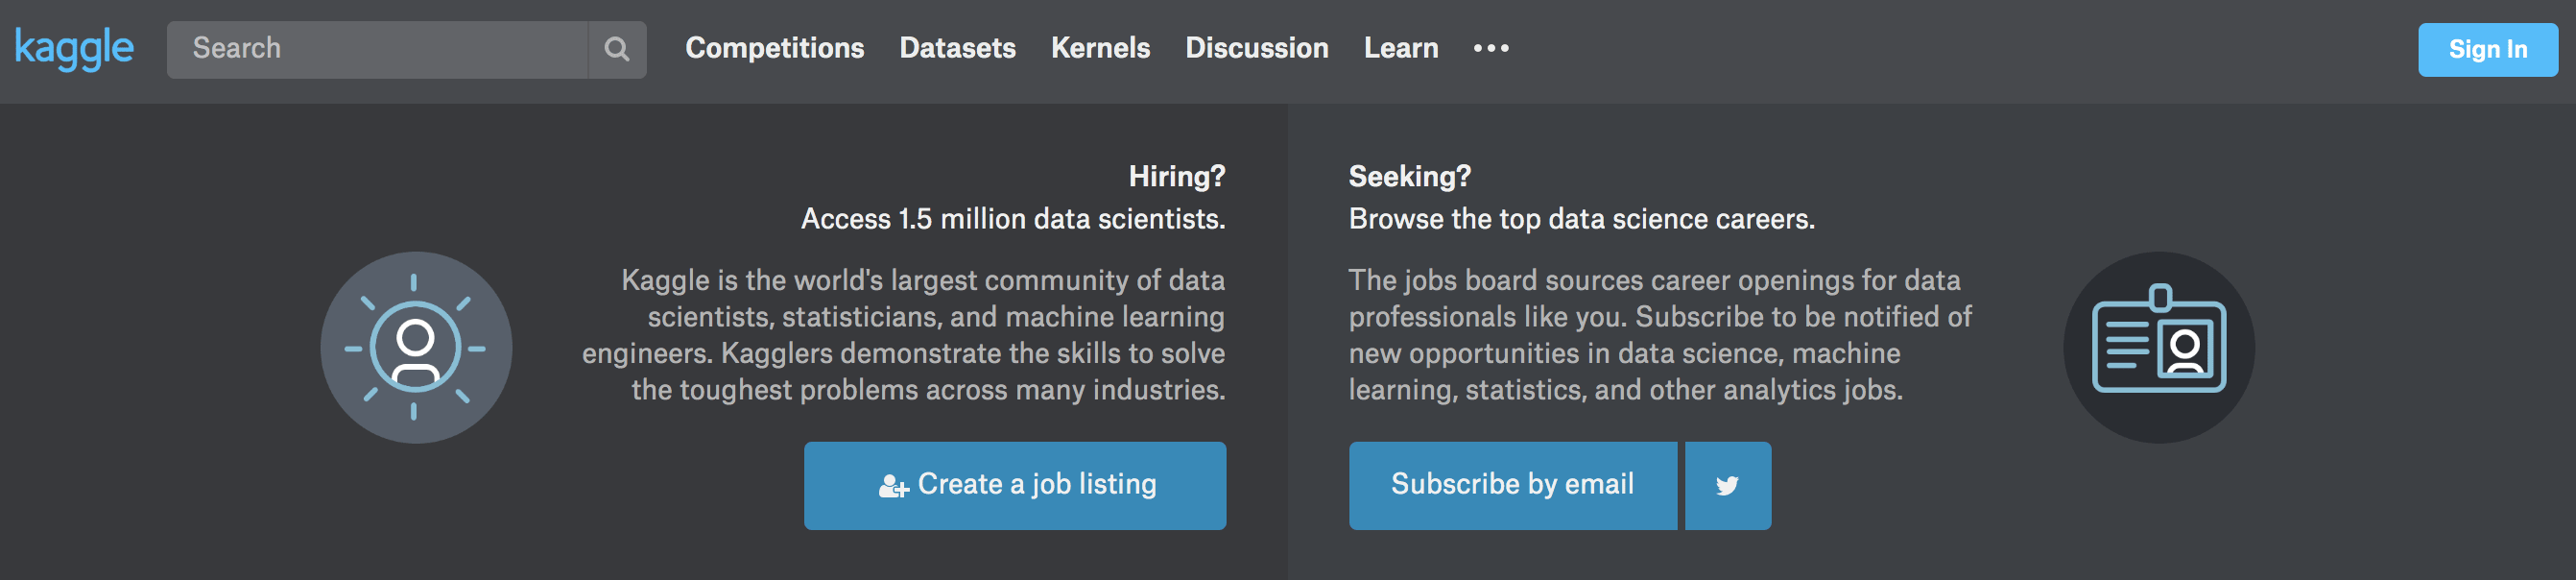 25 Websites to Find Data Science Jobs | Springboard Blog